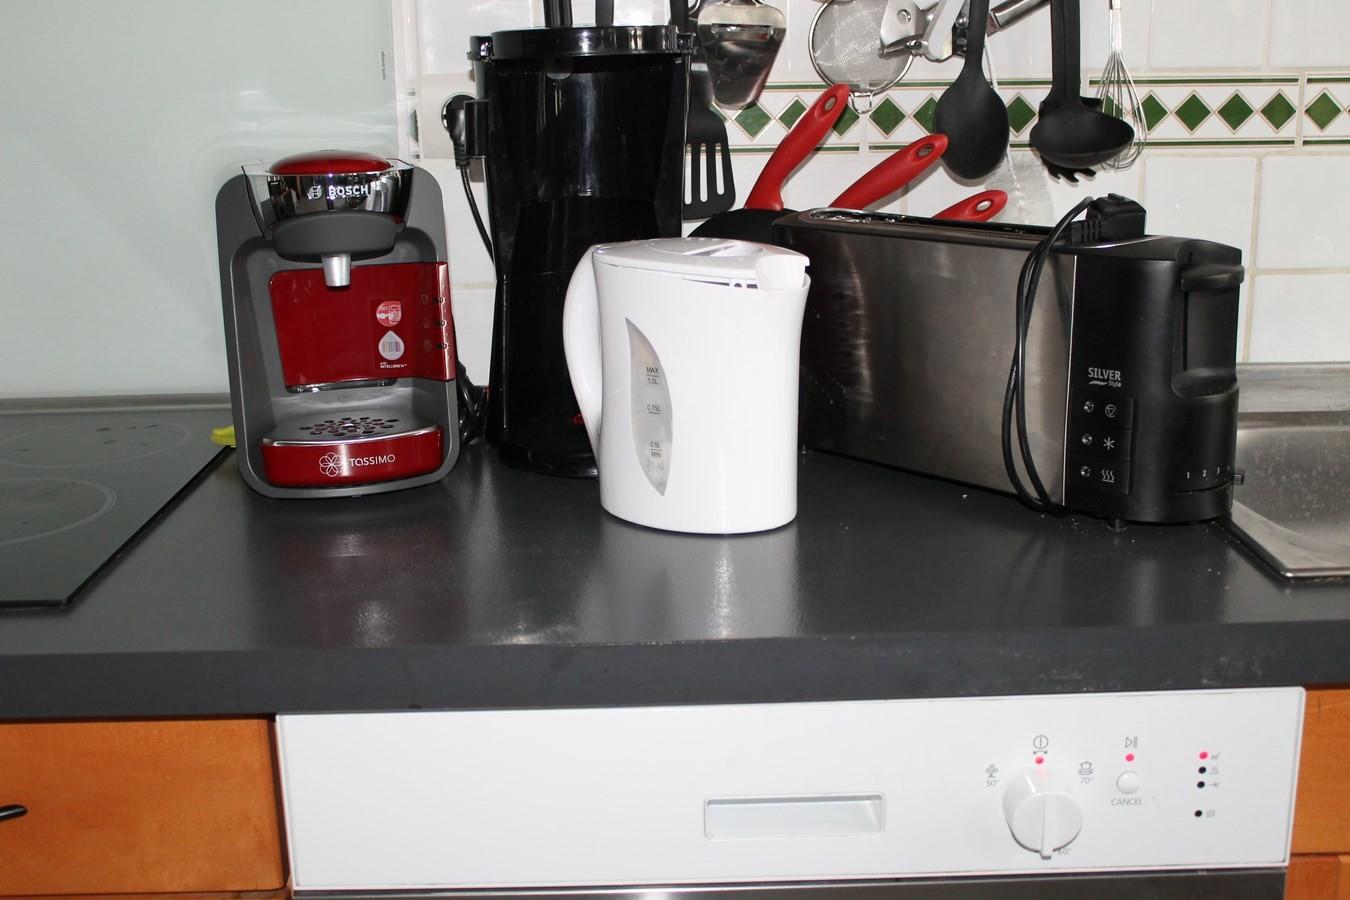 cafetiere filtre, grill pain, bouilloire, tassimo( capsule plastique).